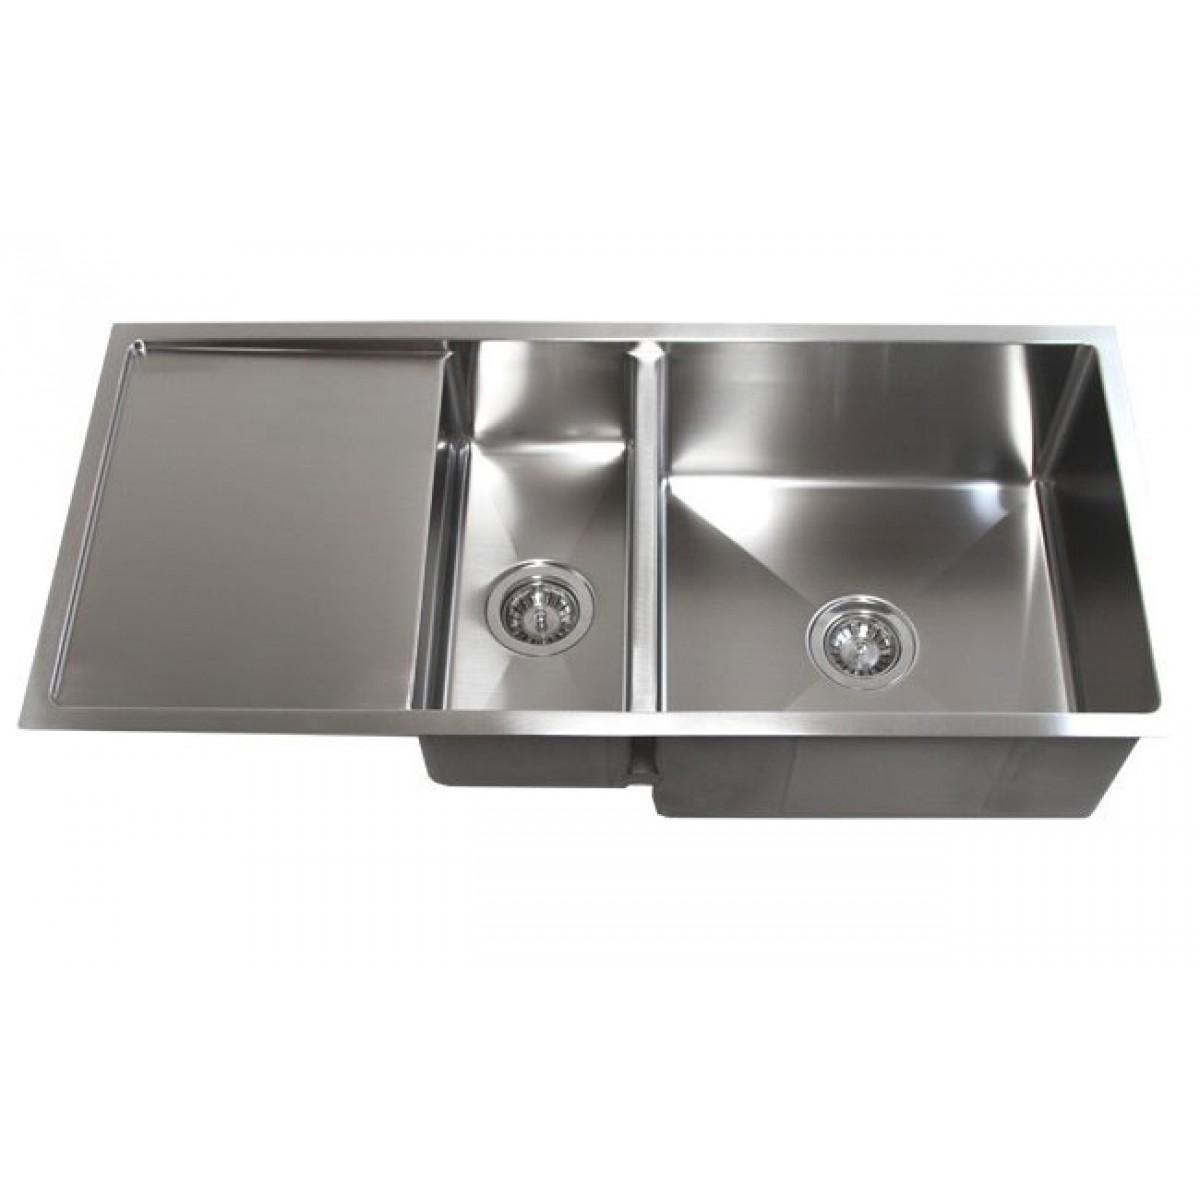 stainless steel kitchen sinks undermount pantry organization 42 inch double bowl